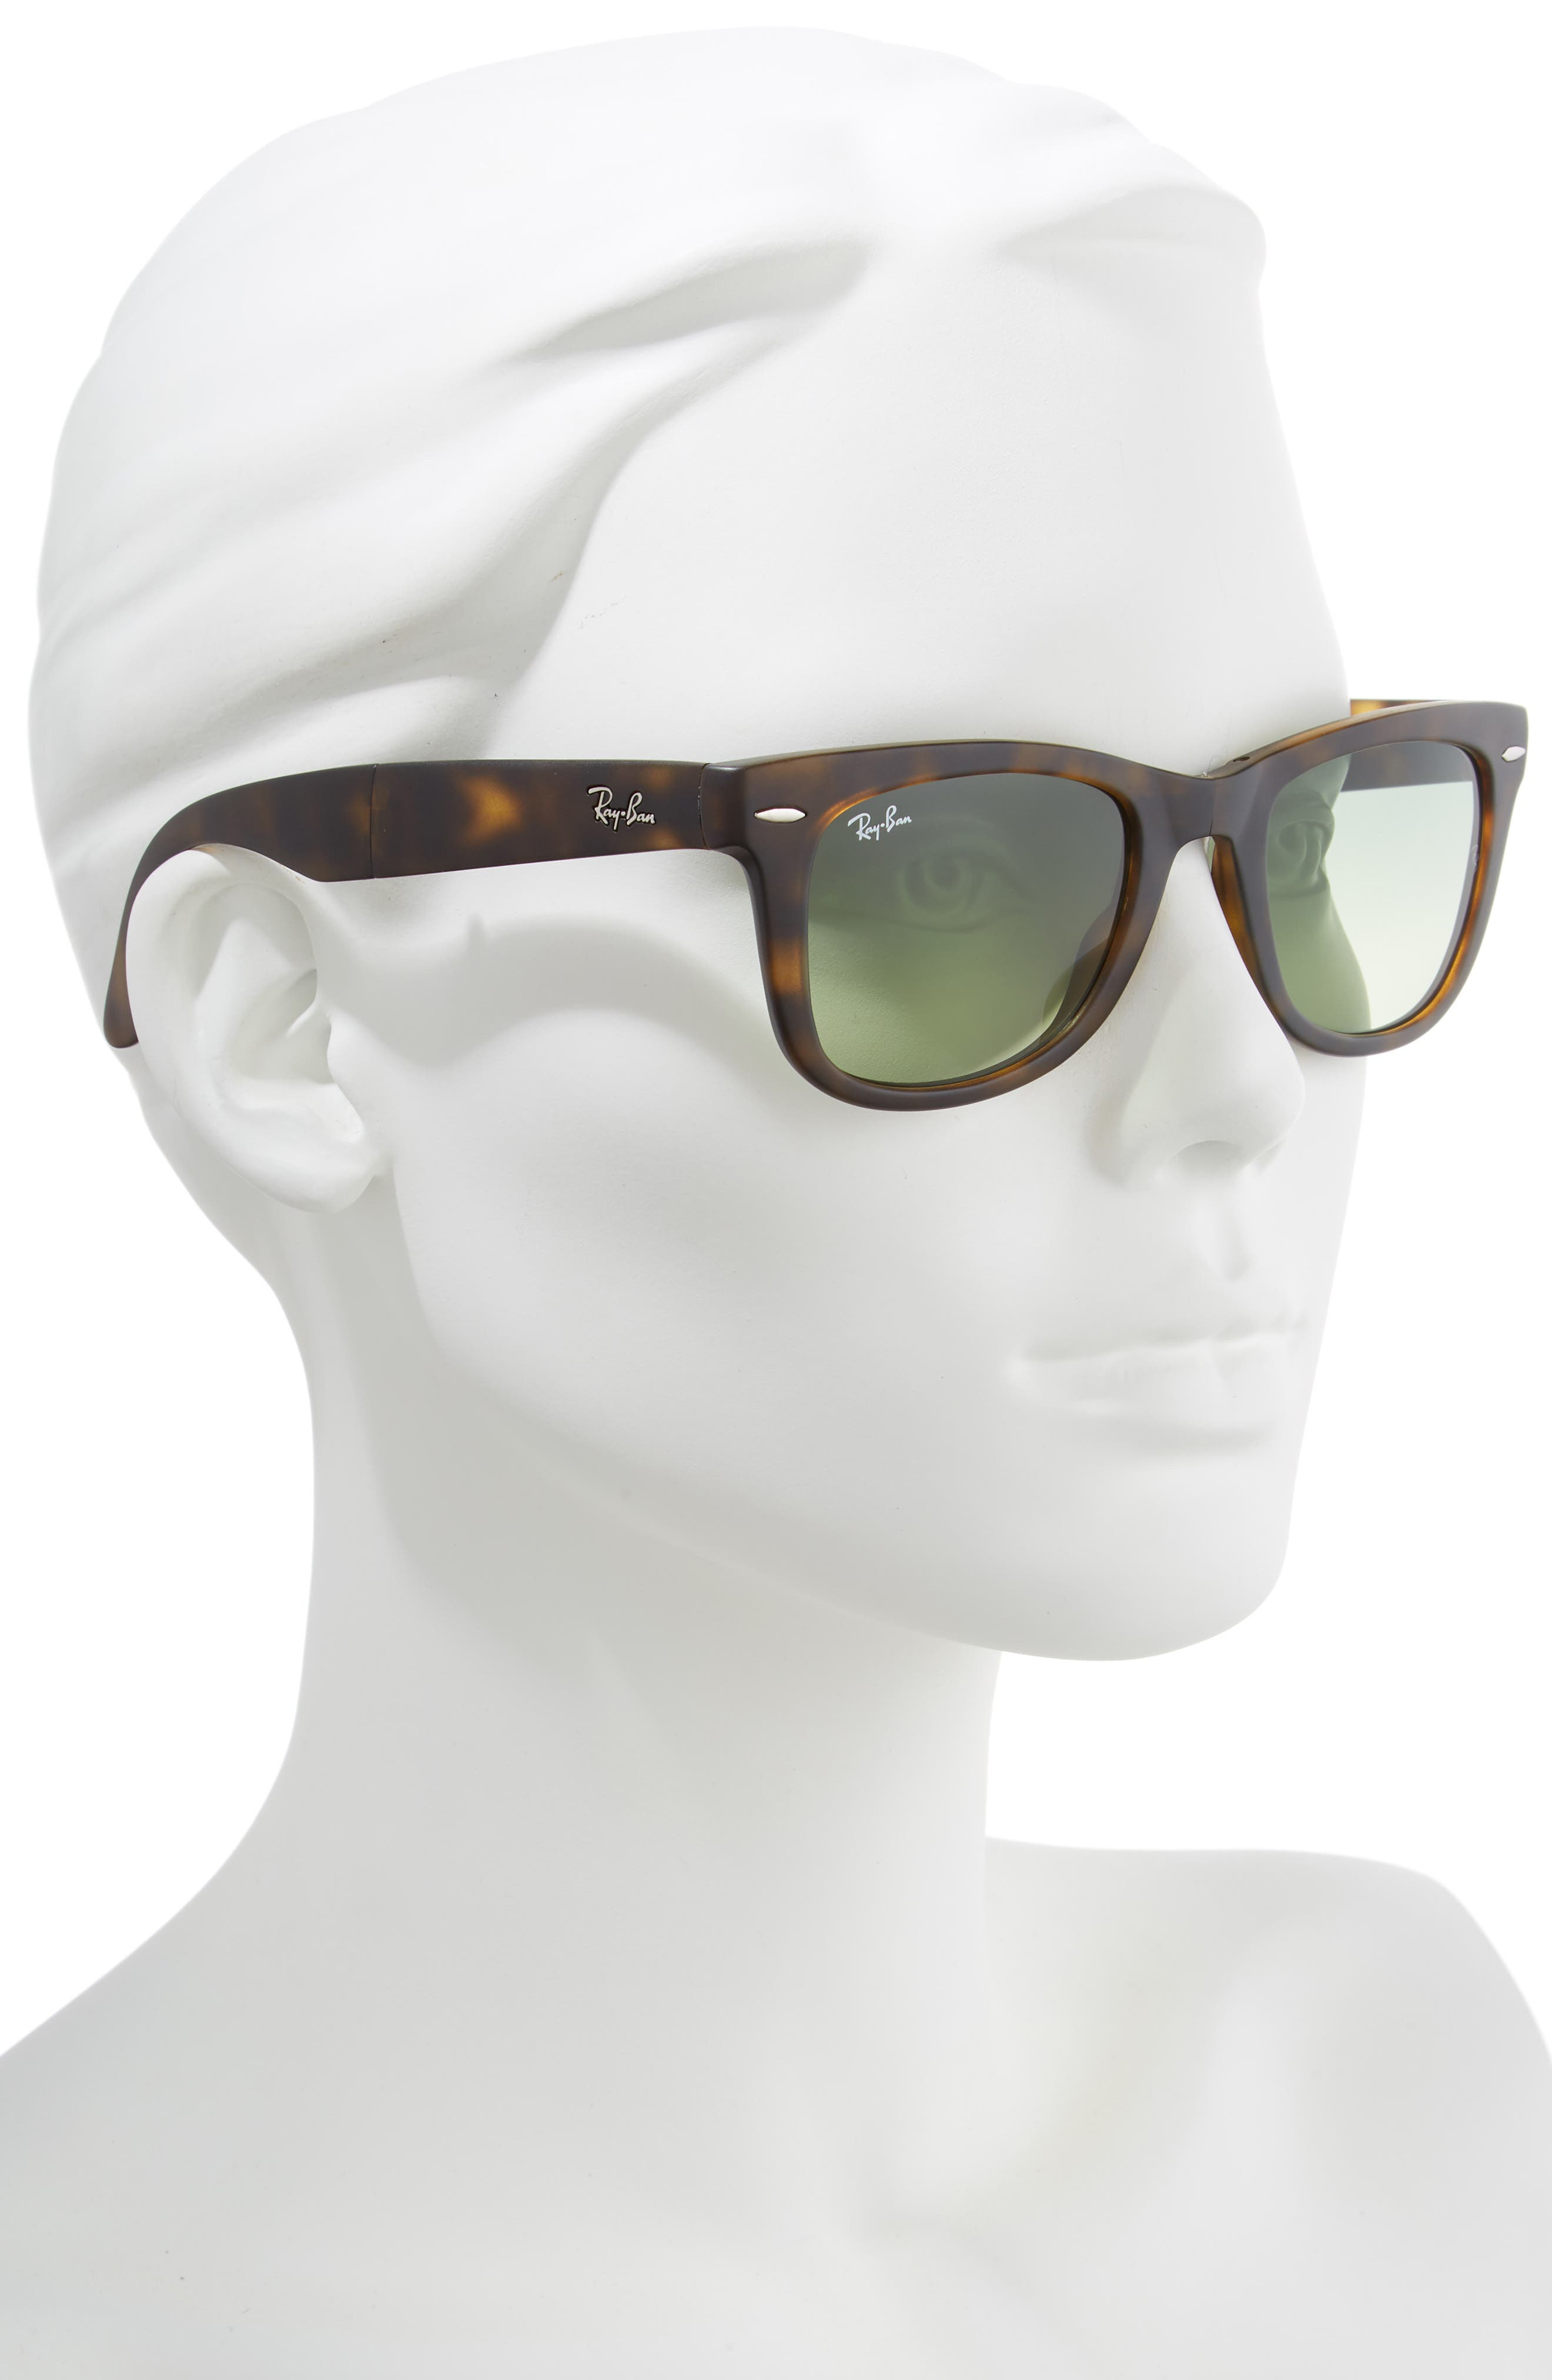 ccddc495fd4 Ray-Ban Wayfarer Sunglasses